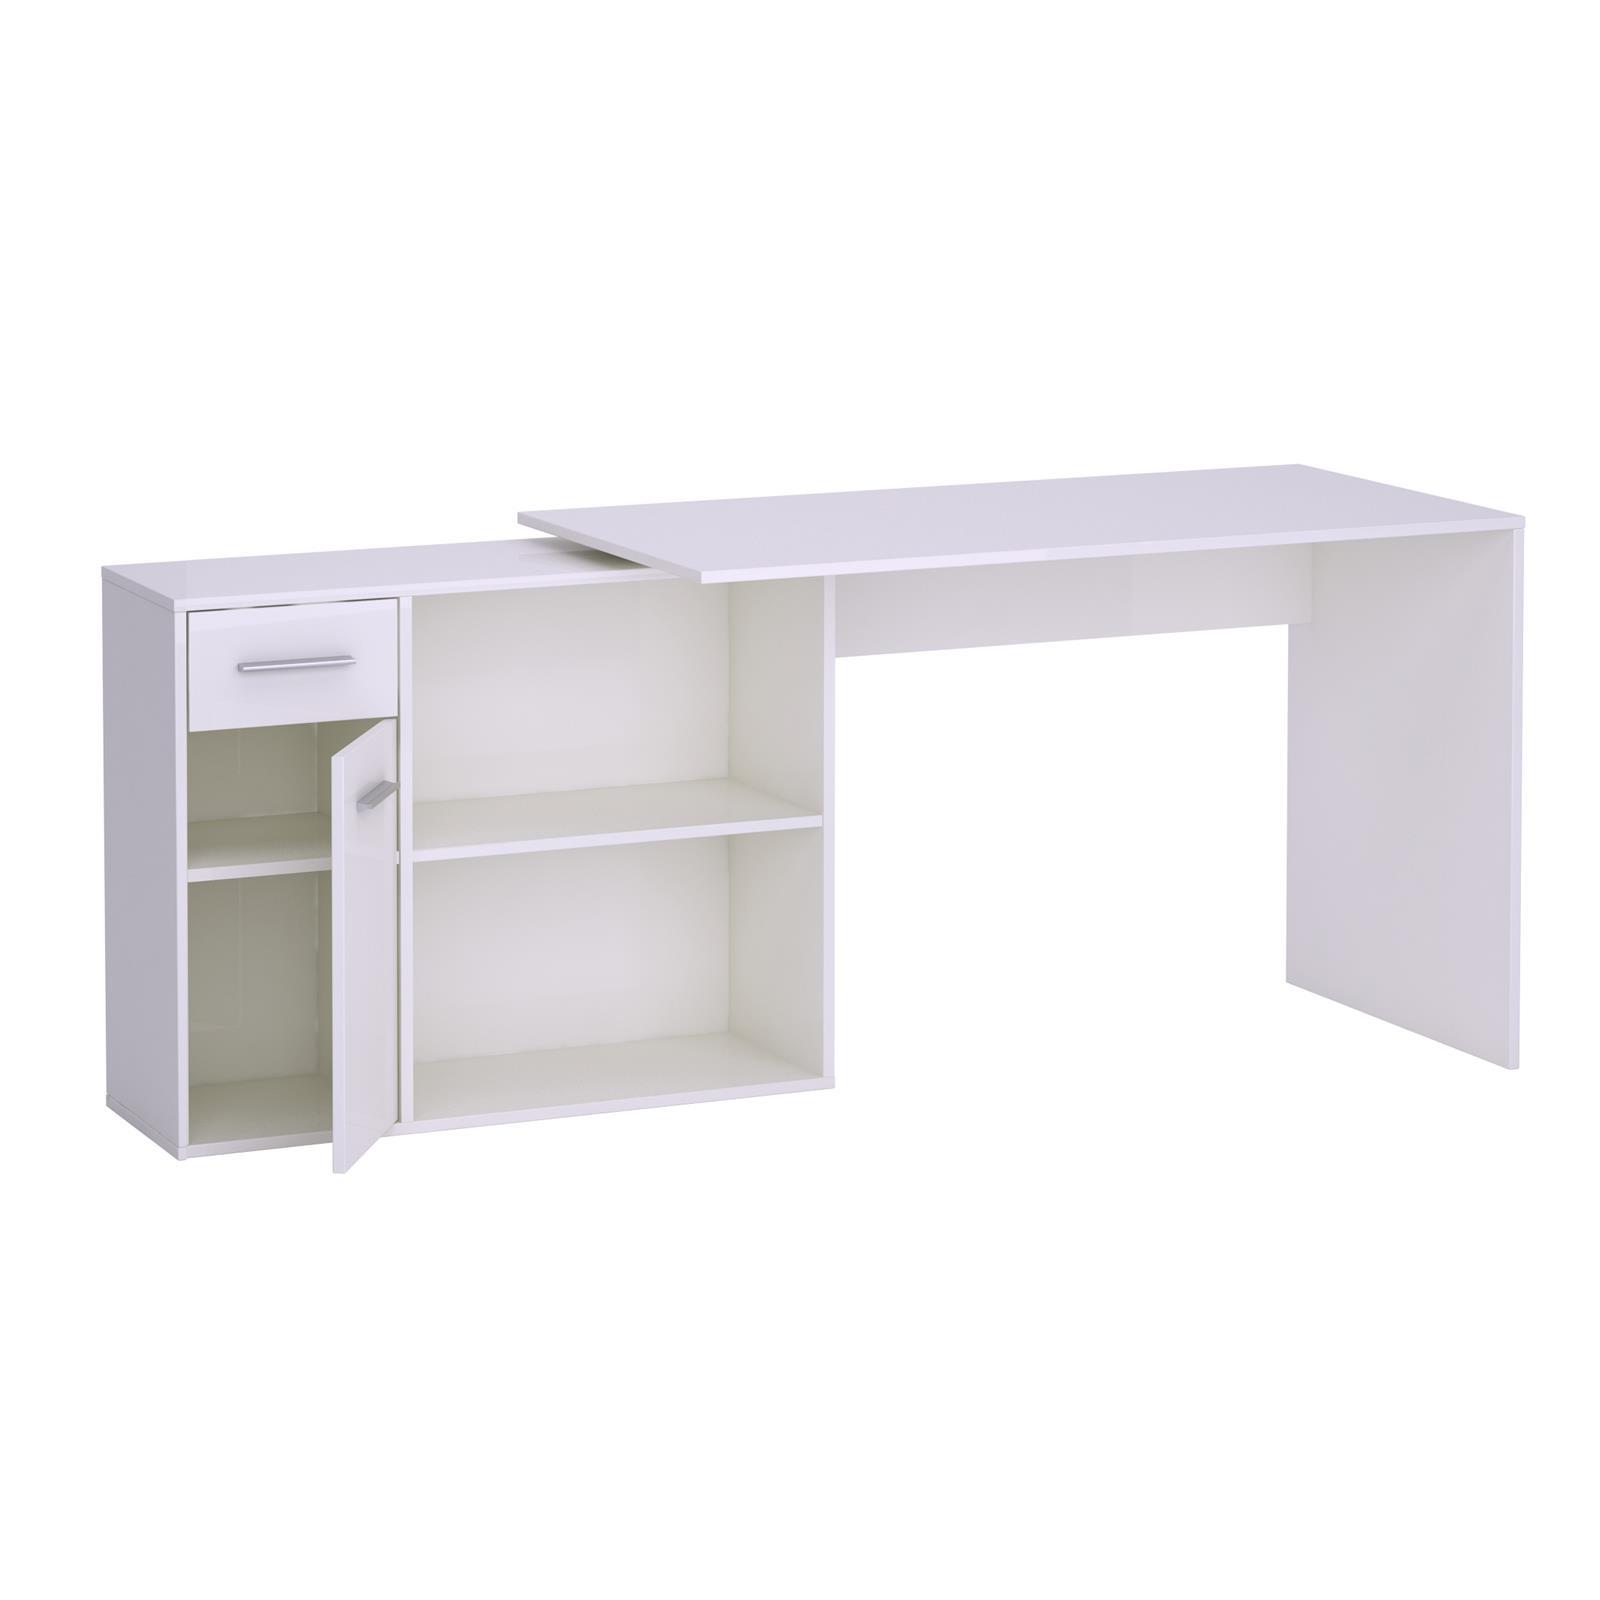 pc tisch wei ikea 2017 09 16 08 03 27. Black Bedroom Furniture Sets. Home Design Ideas